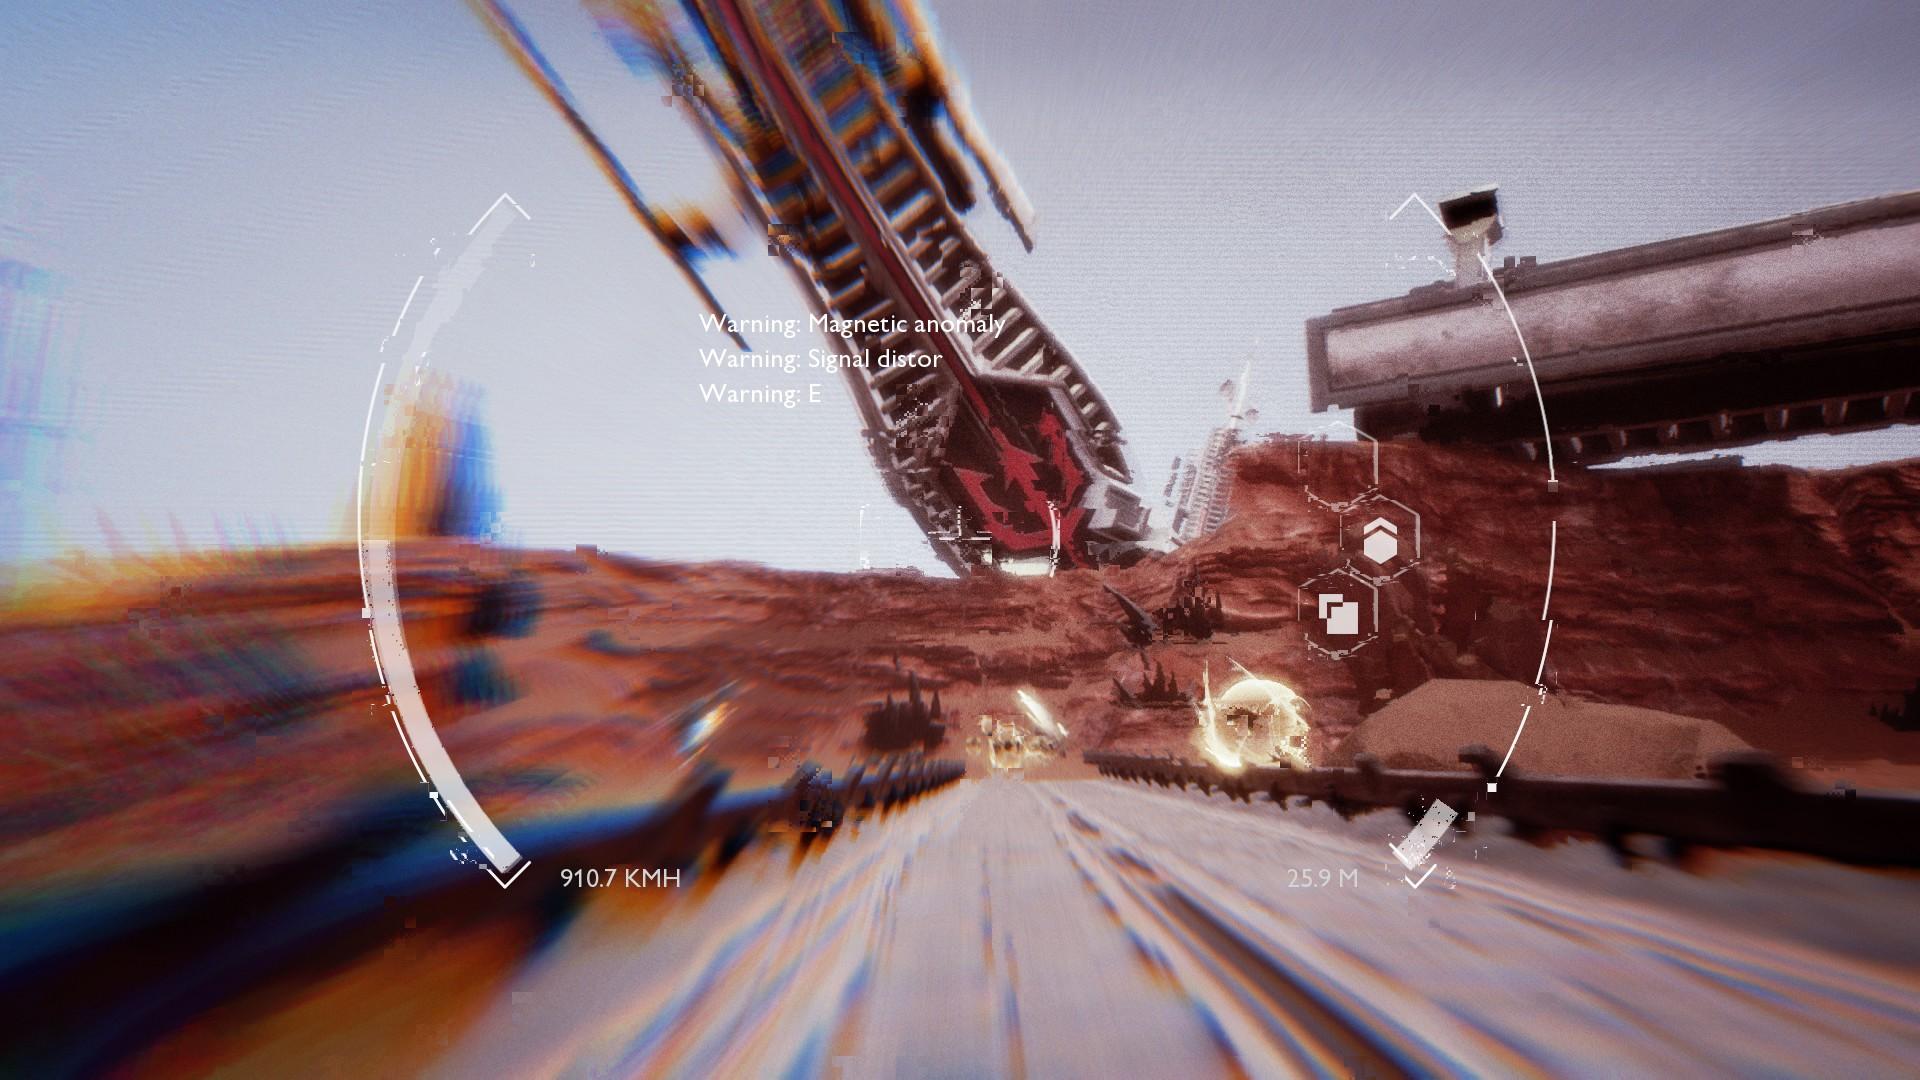 Breached Screenshot 2